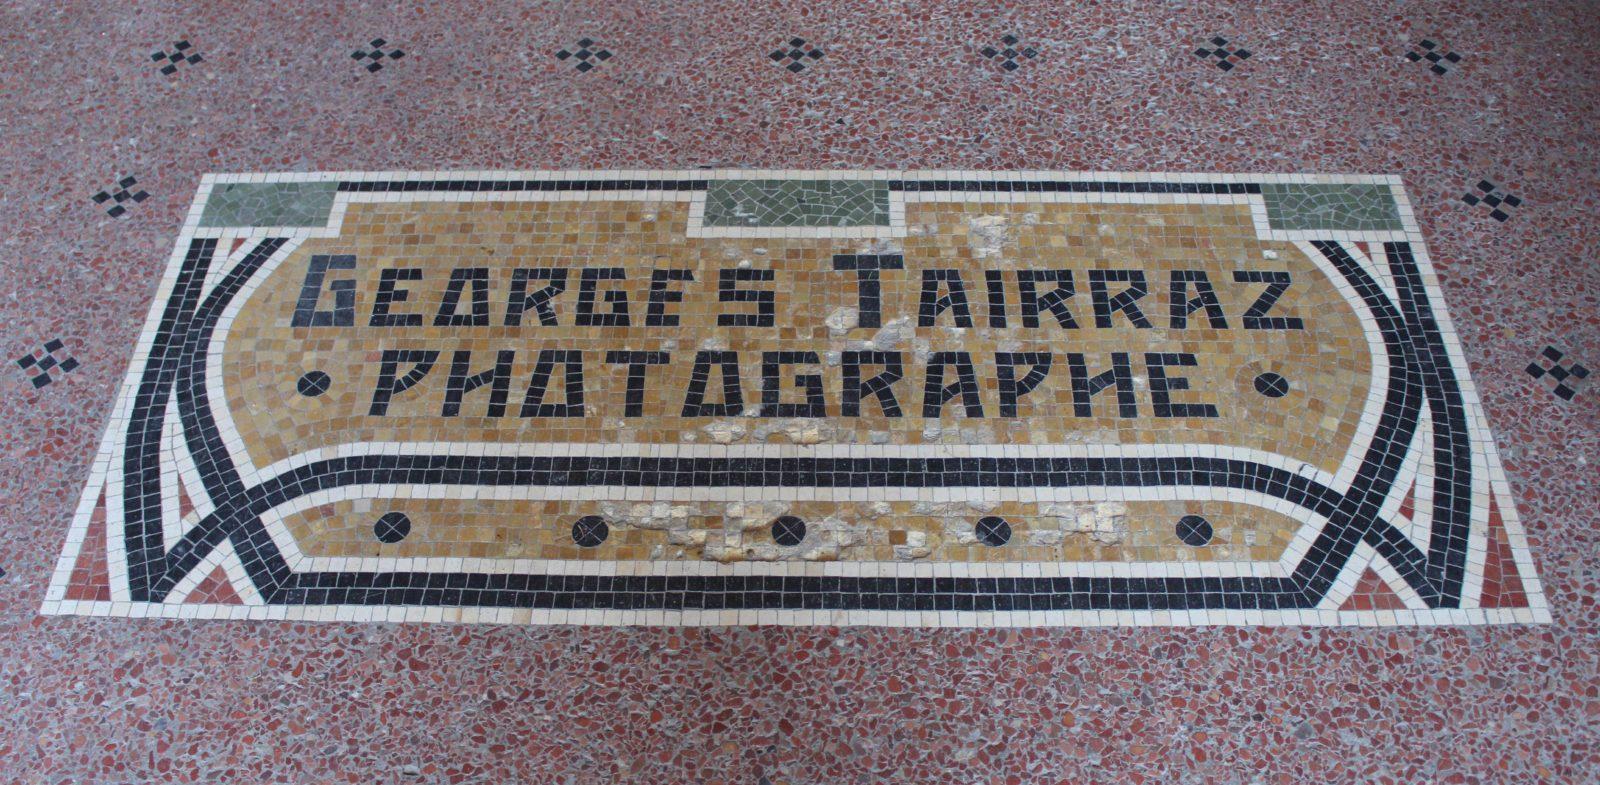 Chamonix maison du photographe Tairaz